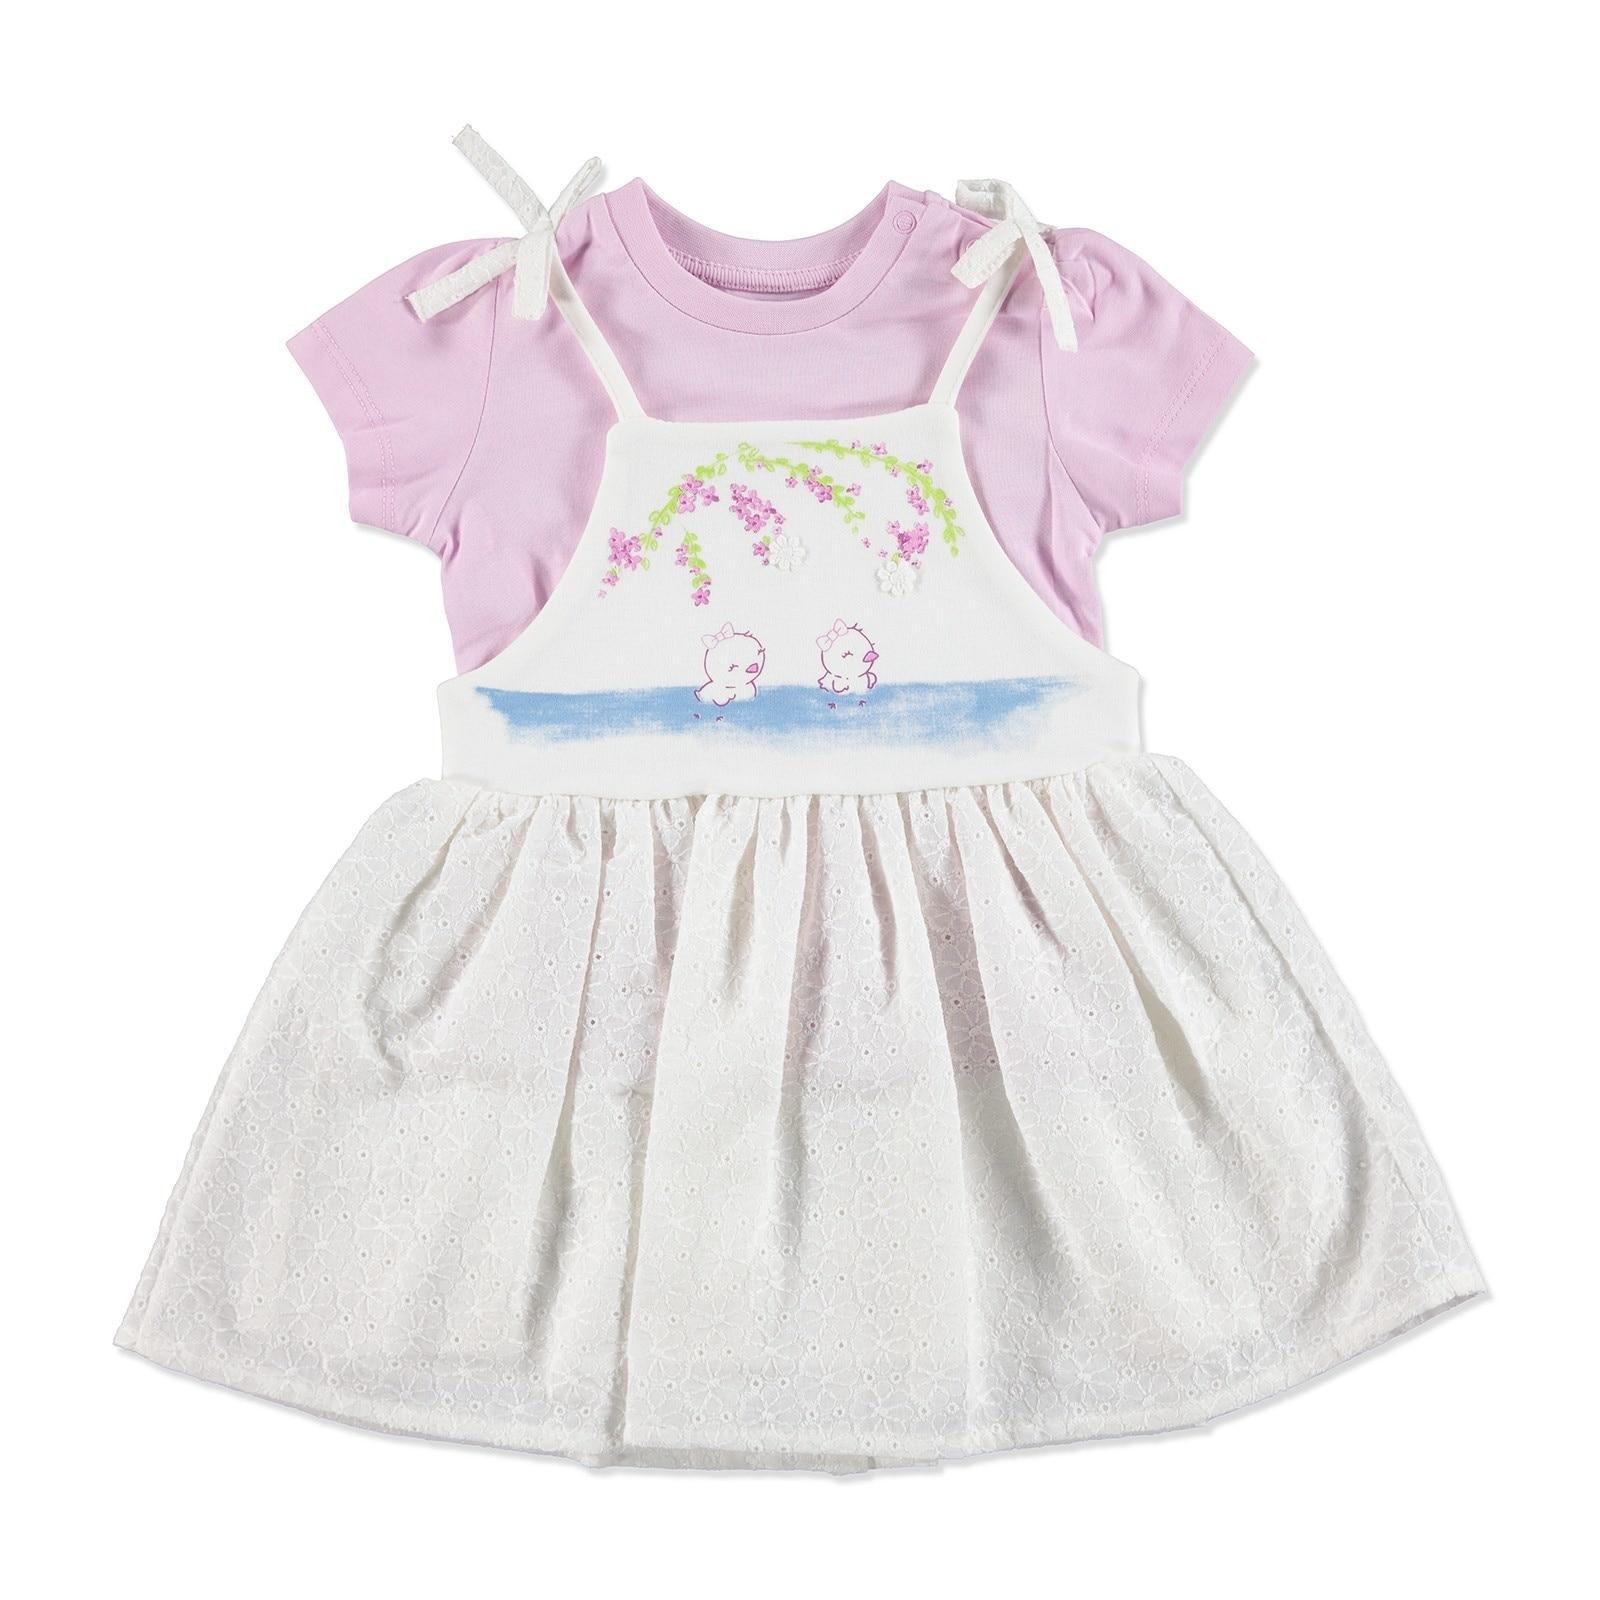 Ebebek HelloBaby Summer Baby Girl Dot Flower Dress T-shirt Set